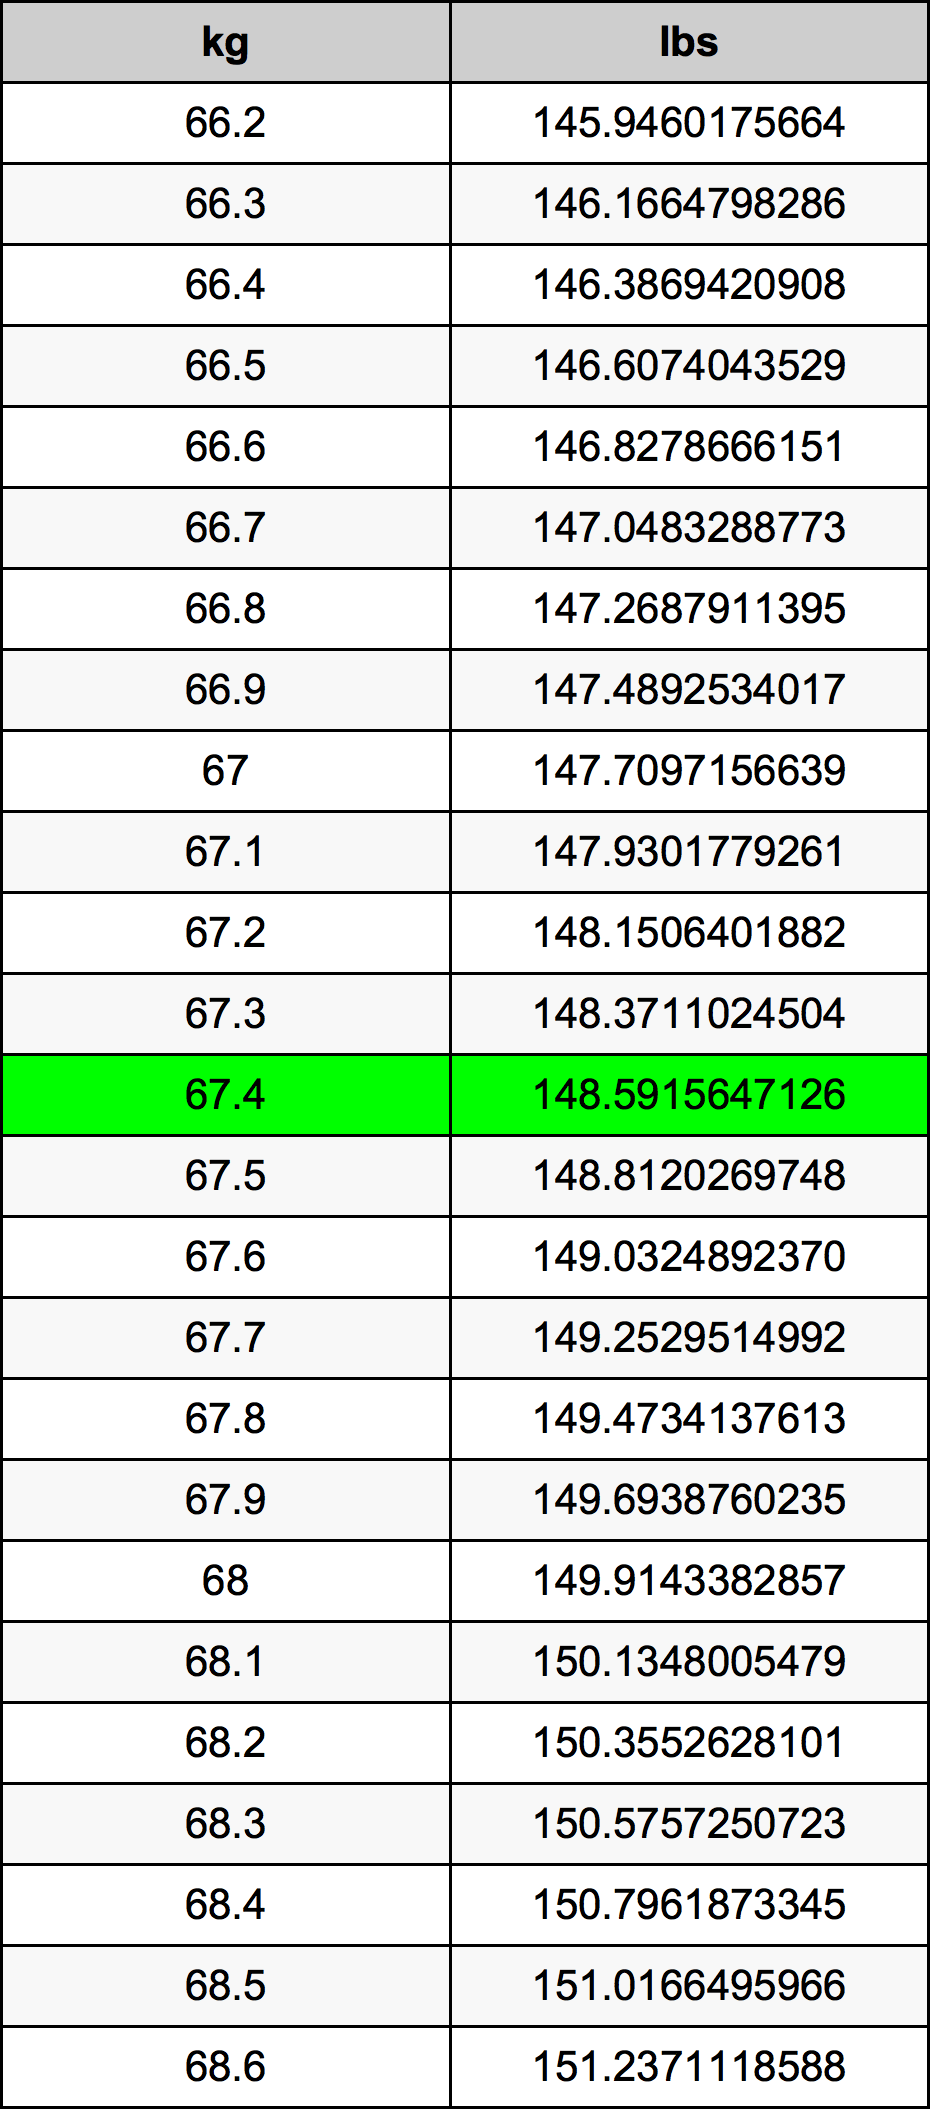 67.4 Kilogramma konverżjoni tabella